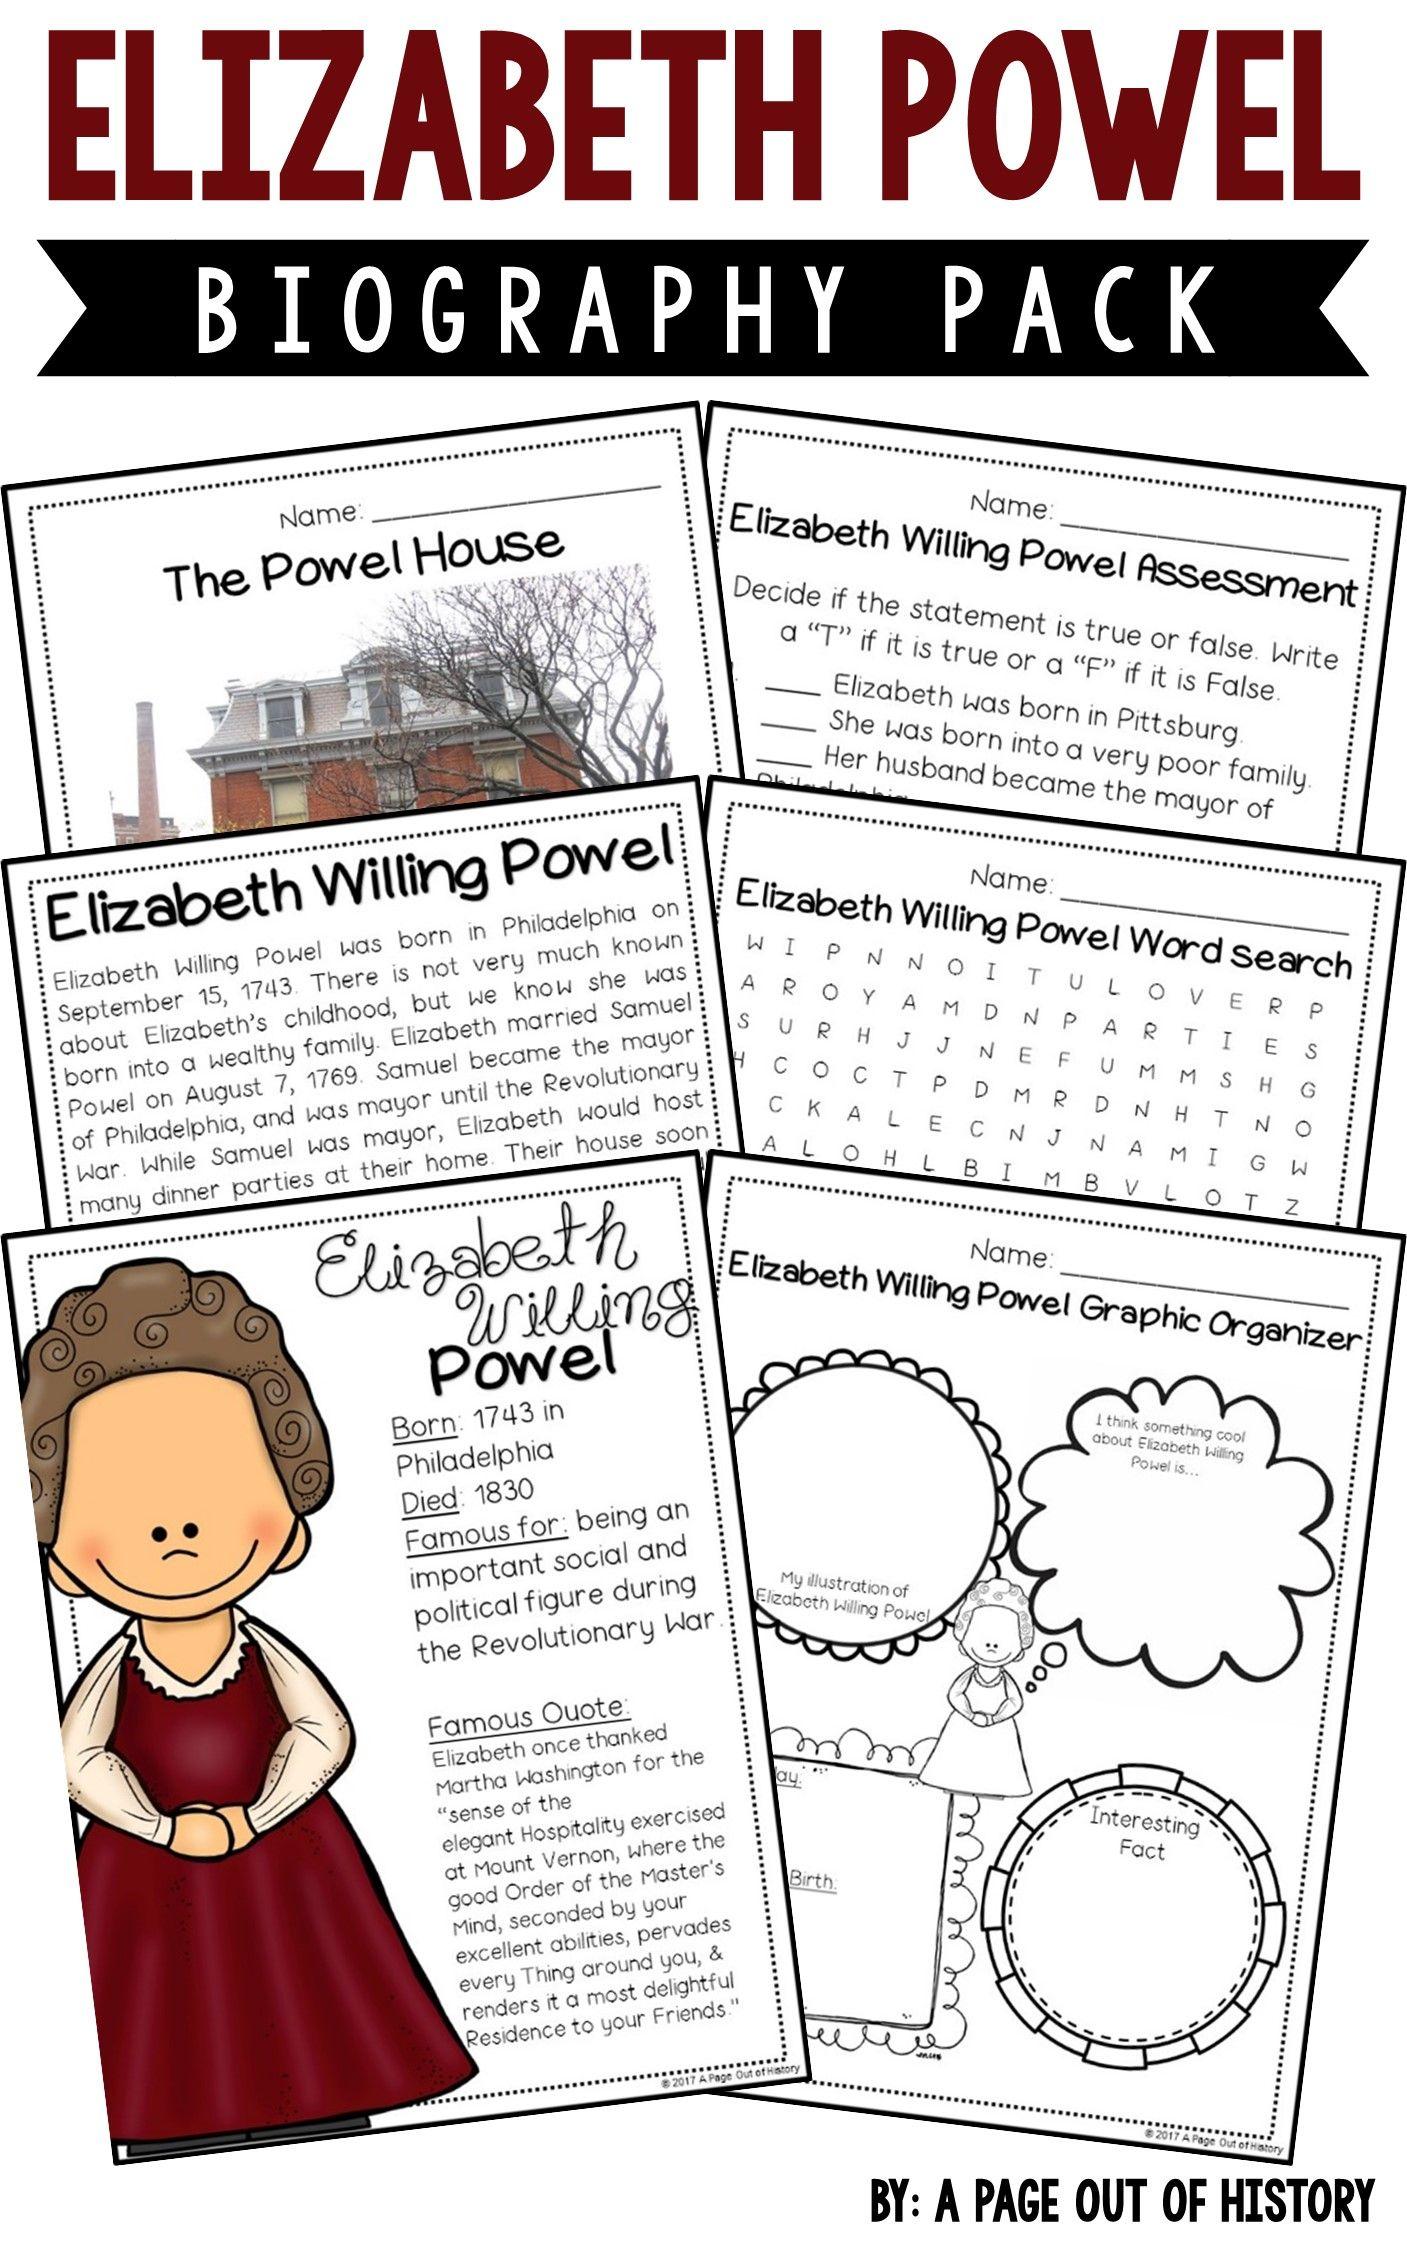 Elizabeth Powel Biography Pack Revolutionary Americans